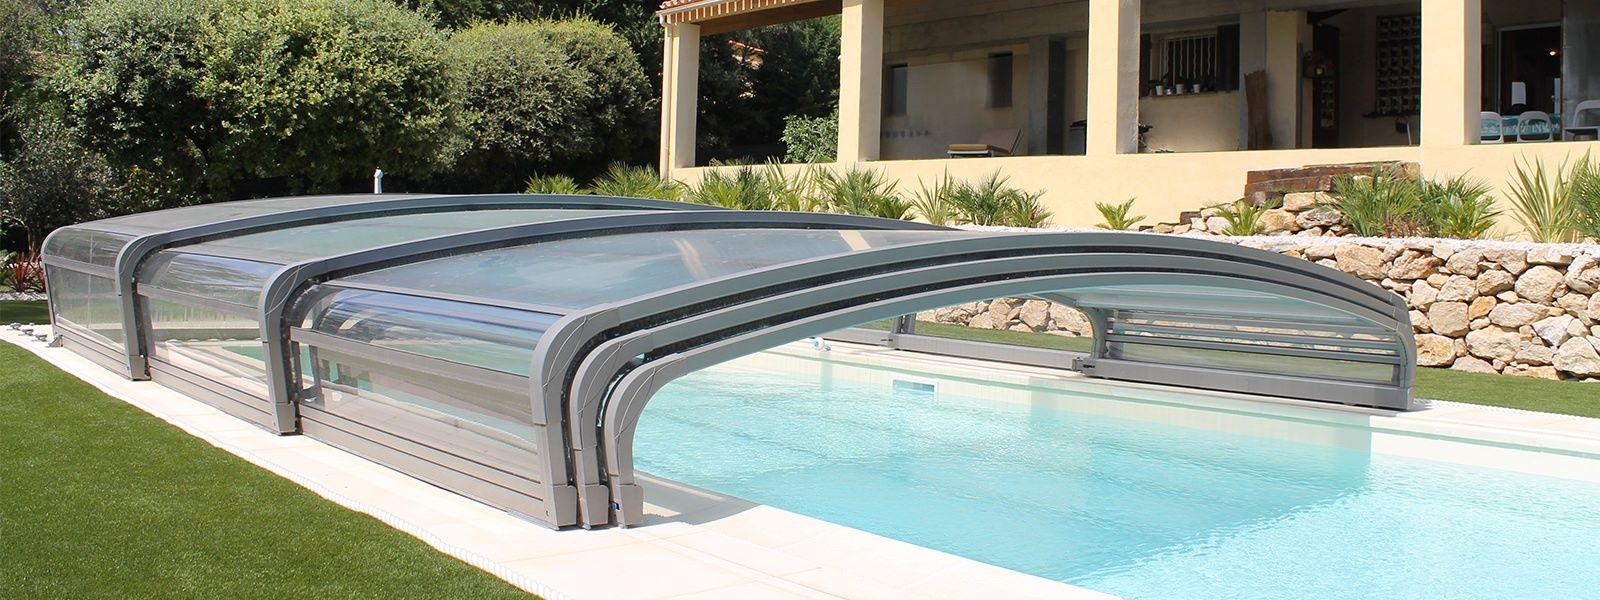 Cubierta de piscina telesc pica cubierta piscina abrisud fabricante cubierta de piscina - Fabricante de piscinas ...